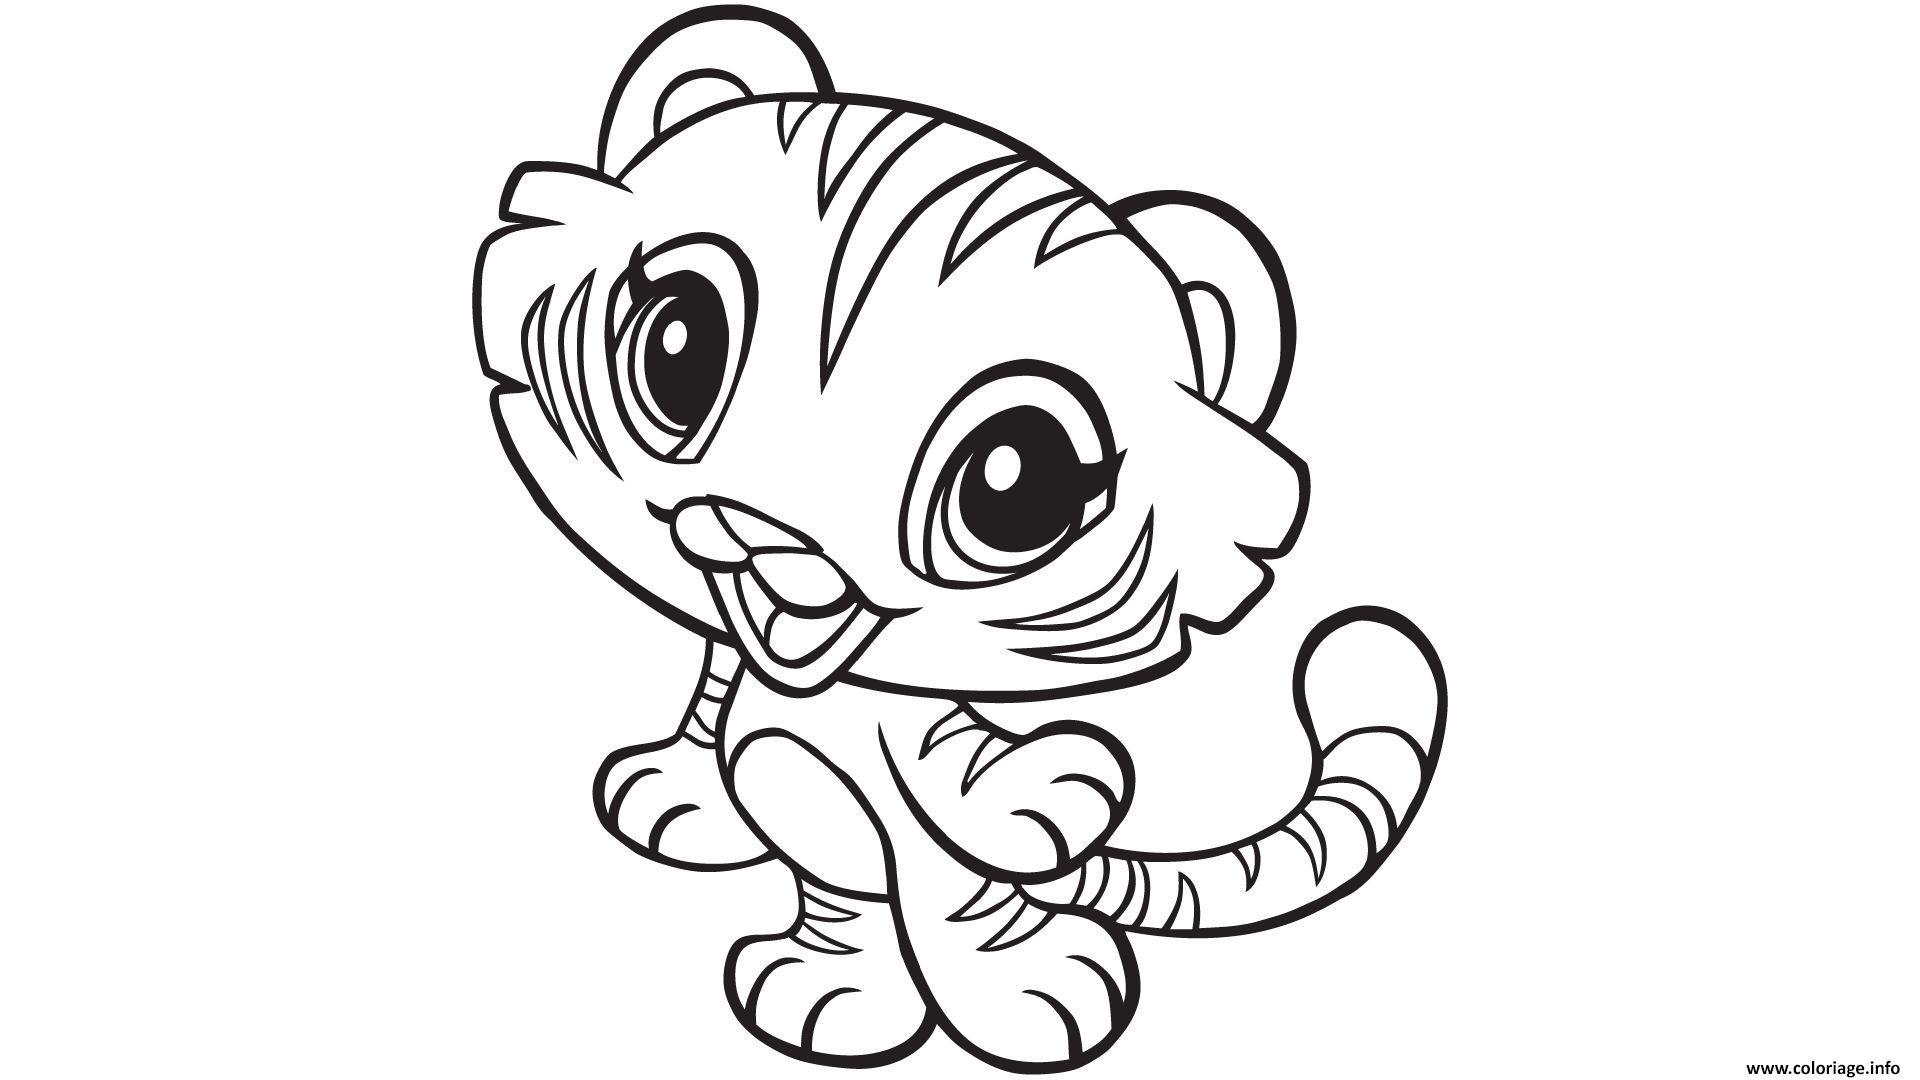 Coloriage Kawaii Animaux Tigre